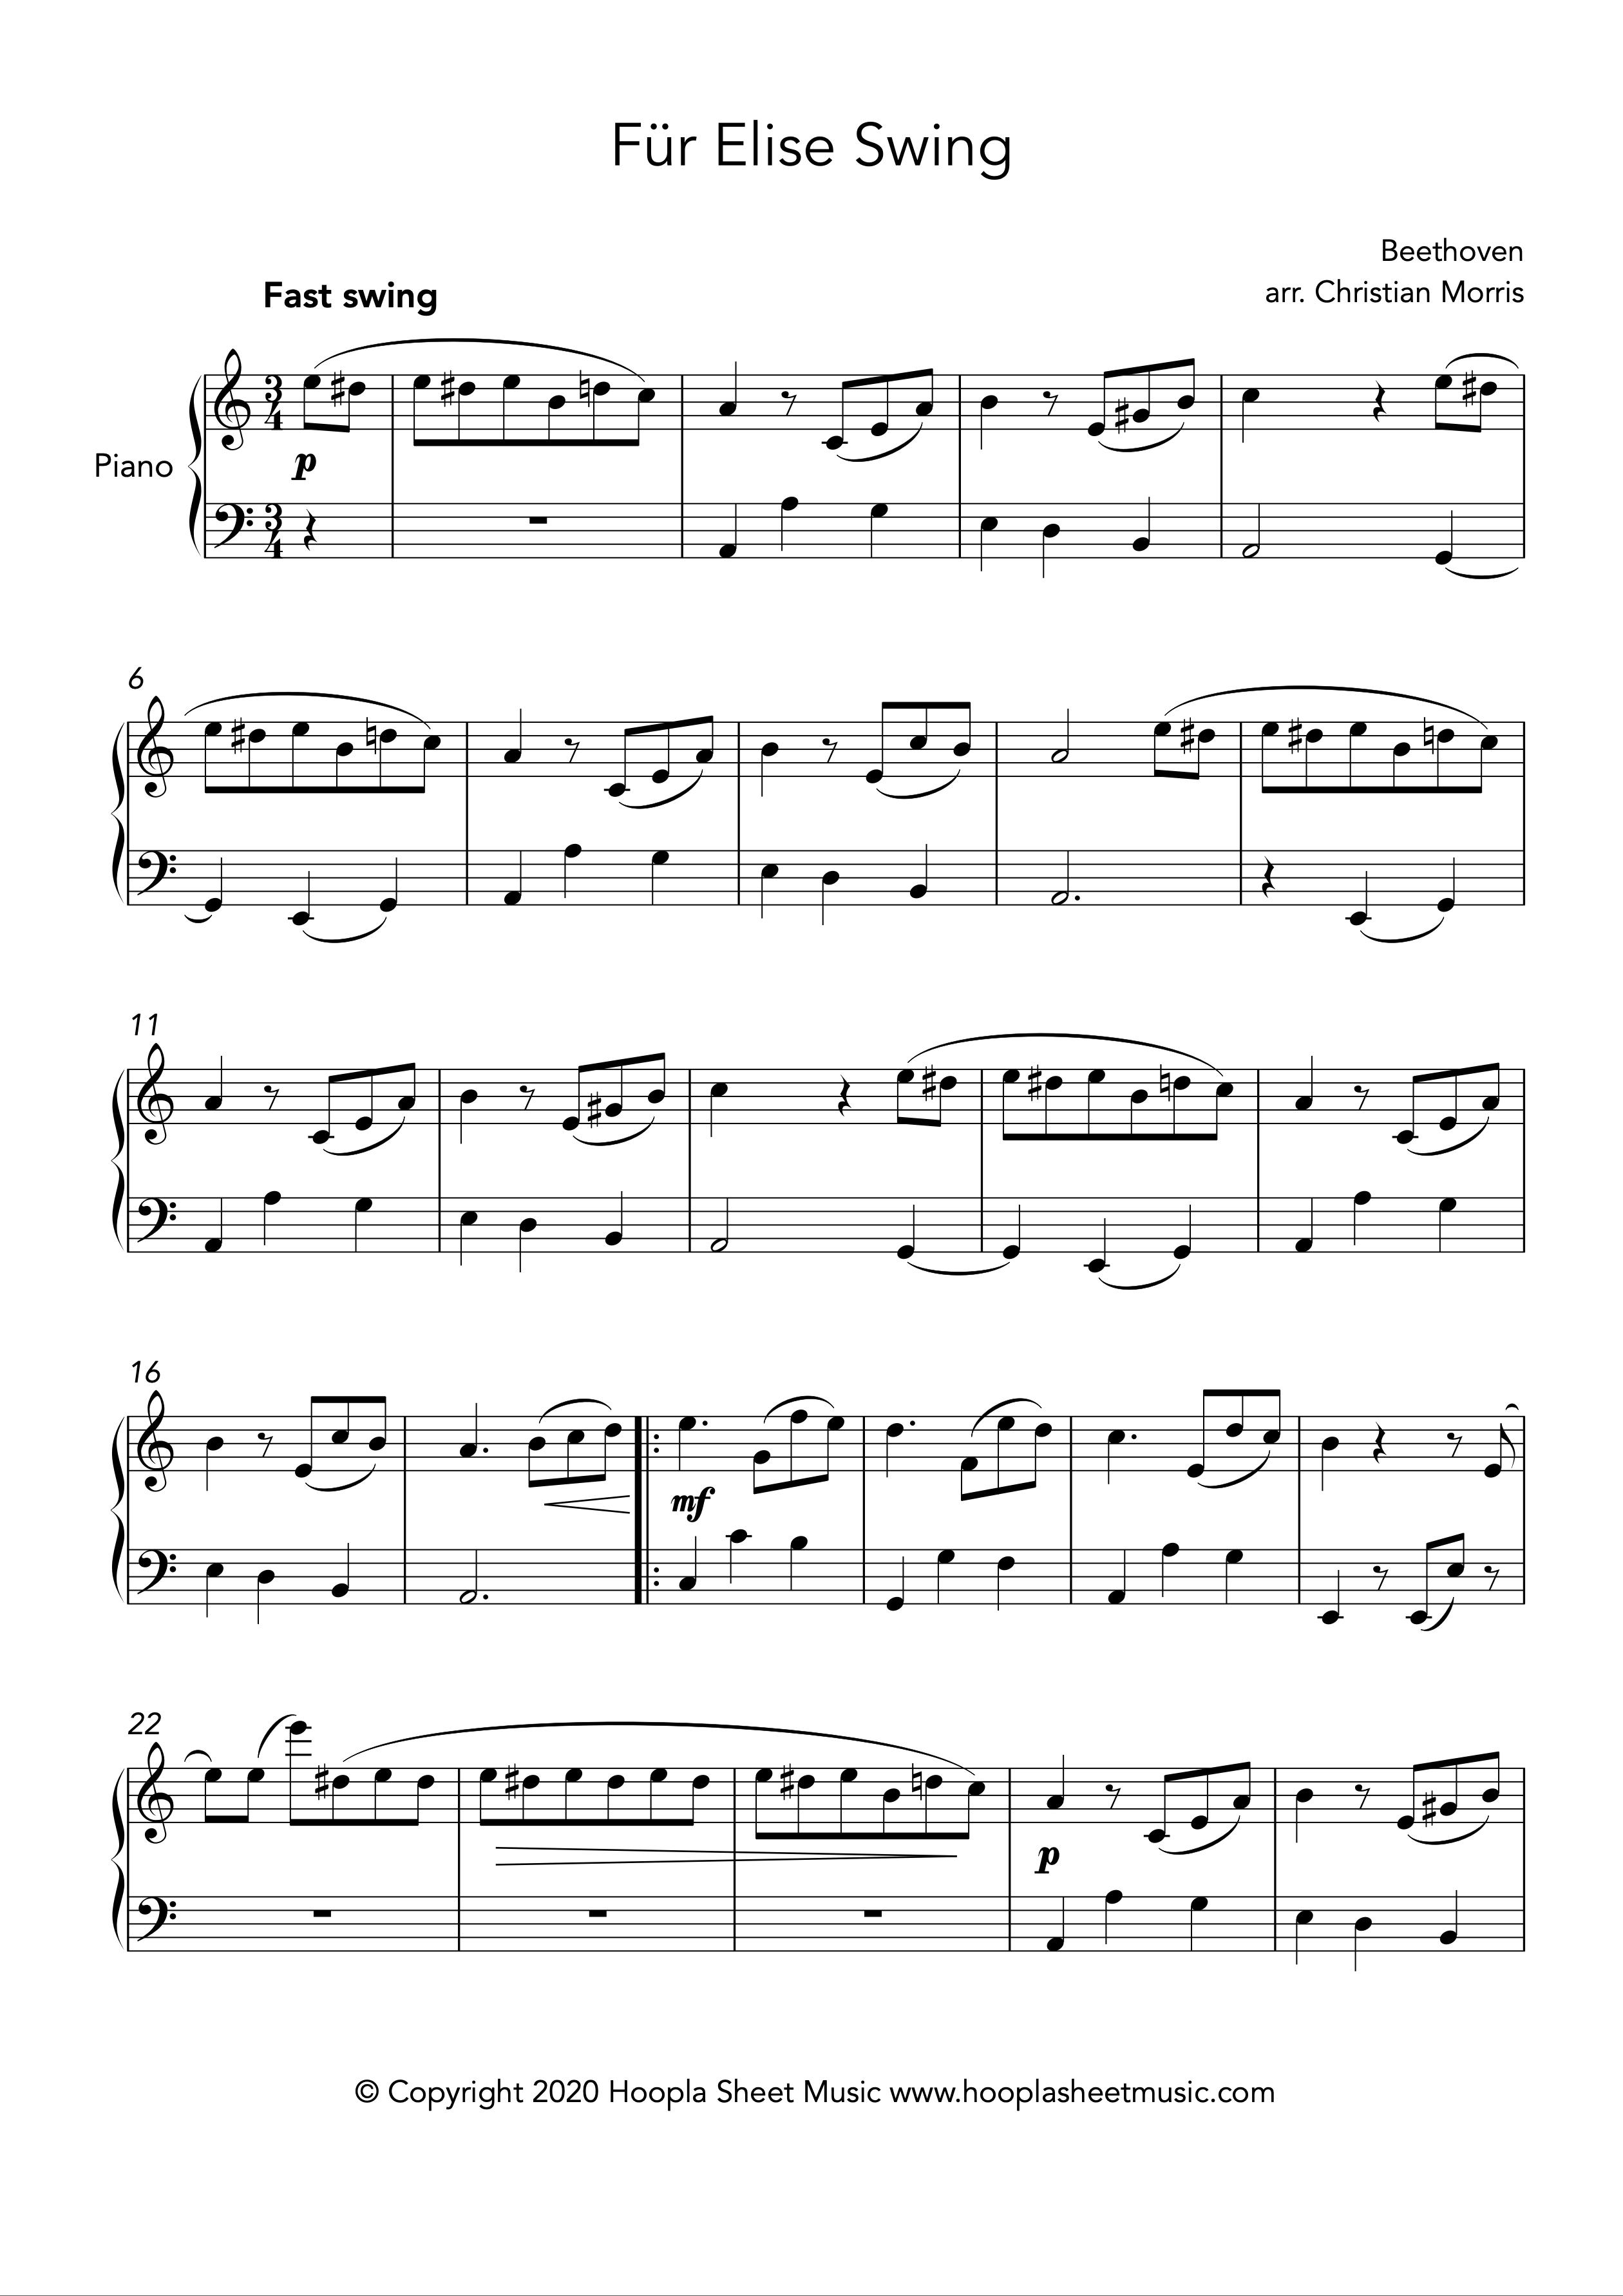 Für Elise Swing (Piano)